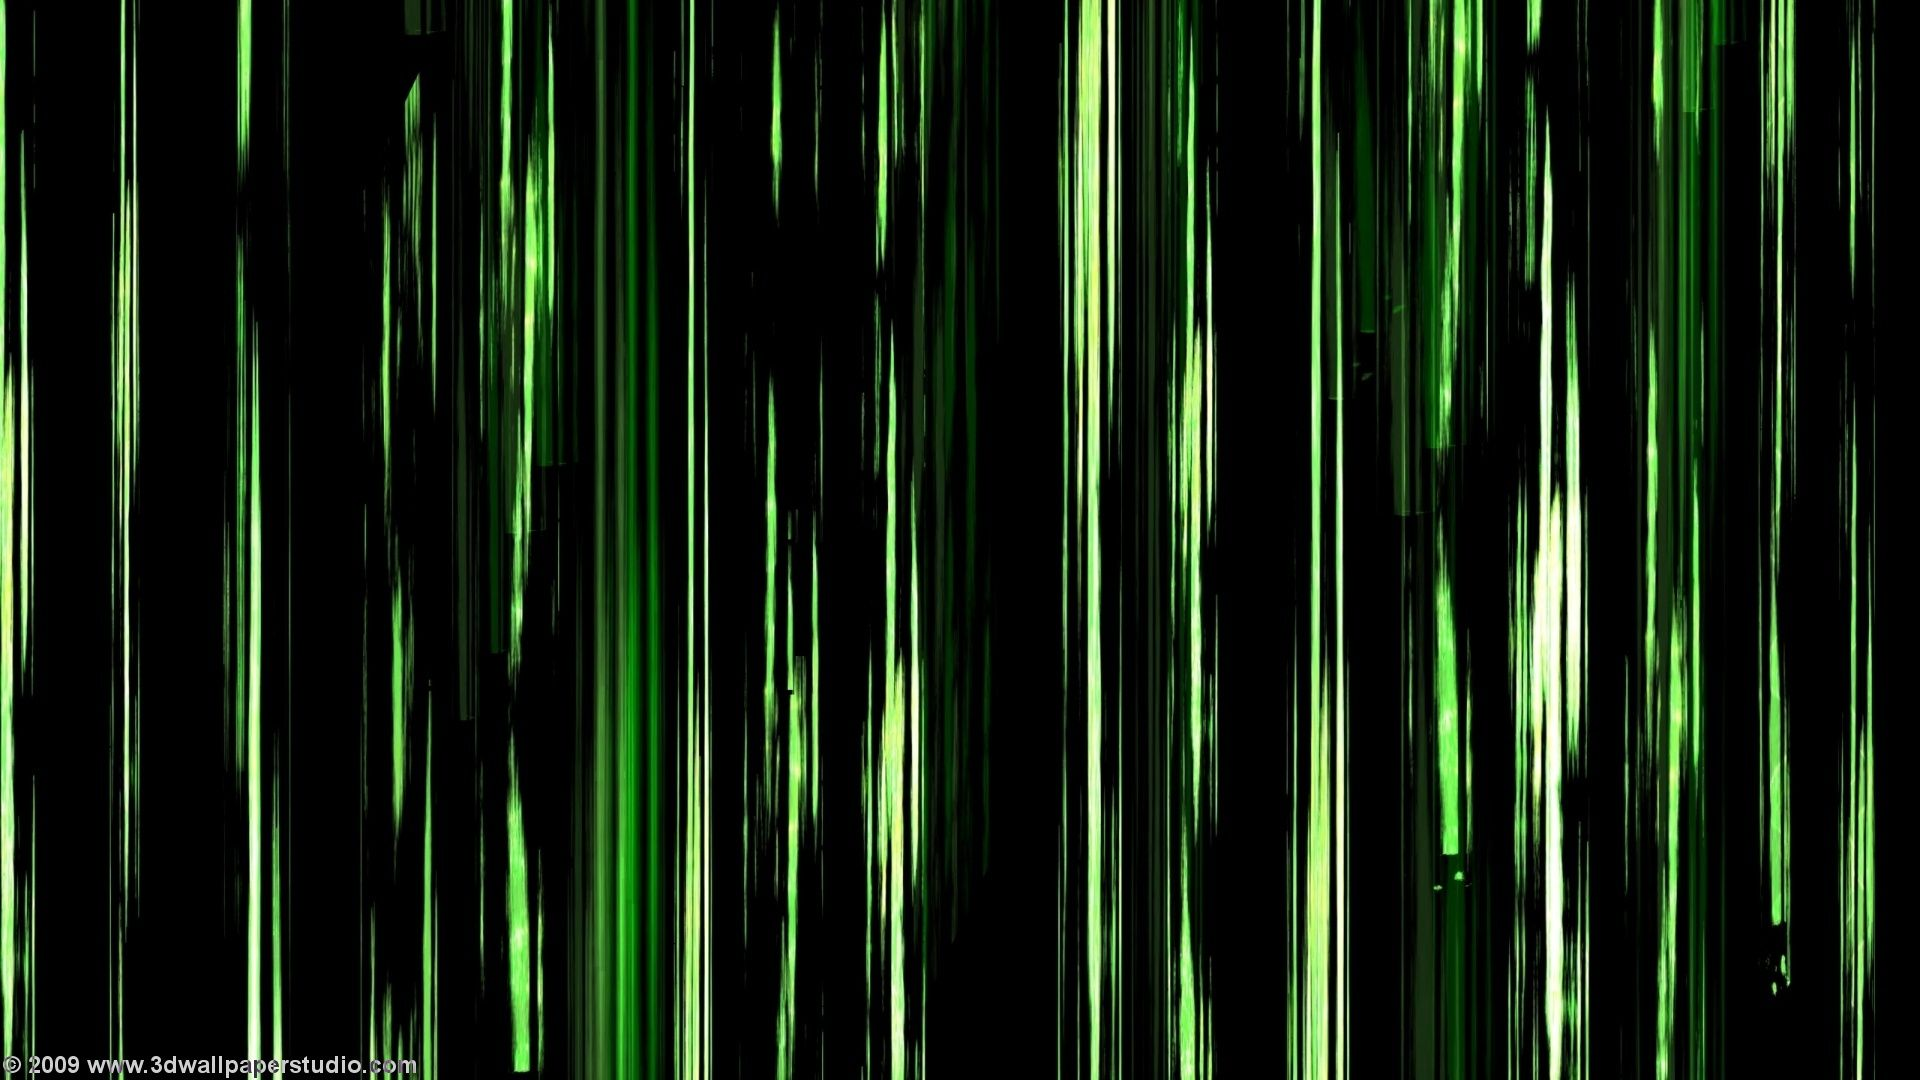 Cool Green full hd wallpaper download